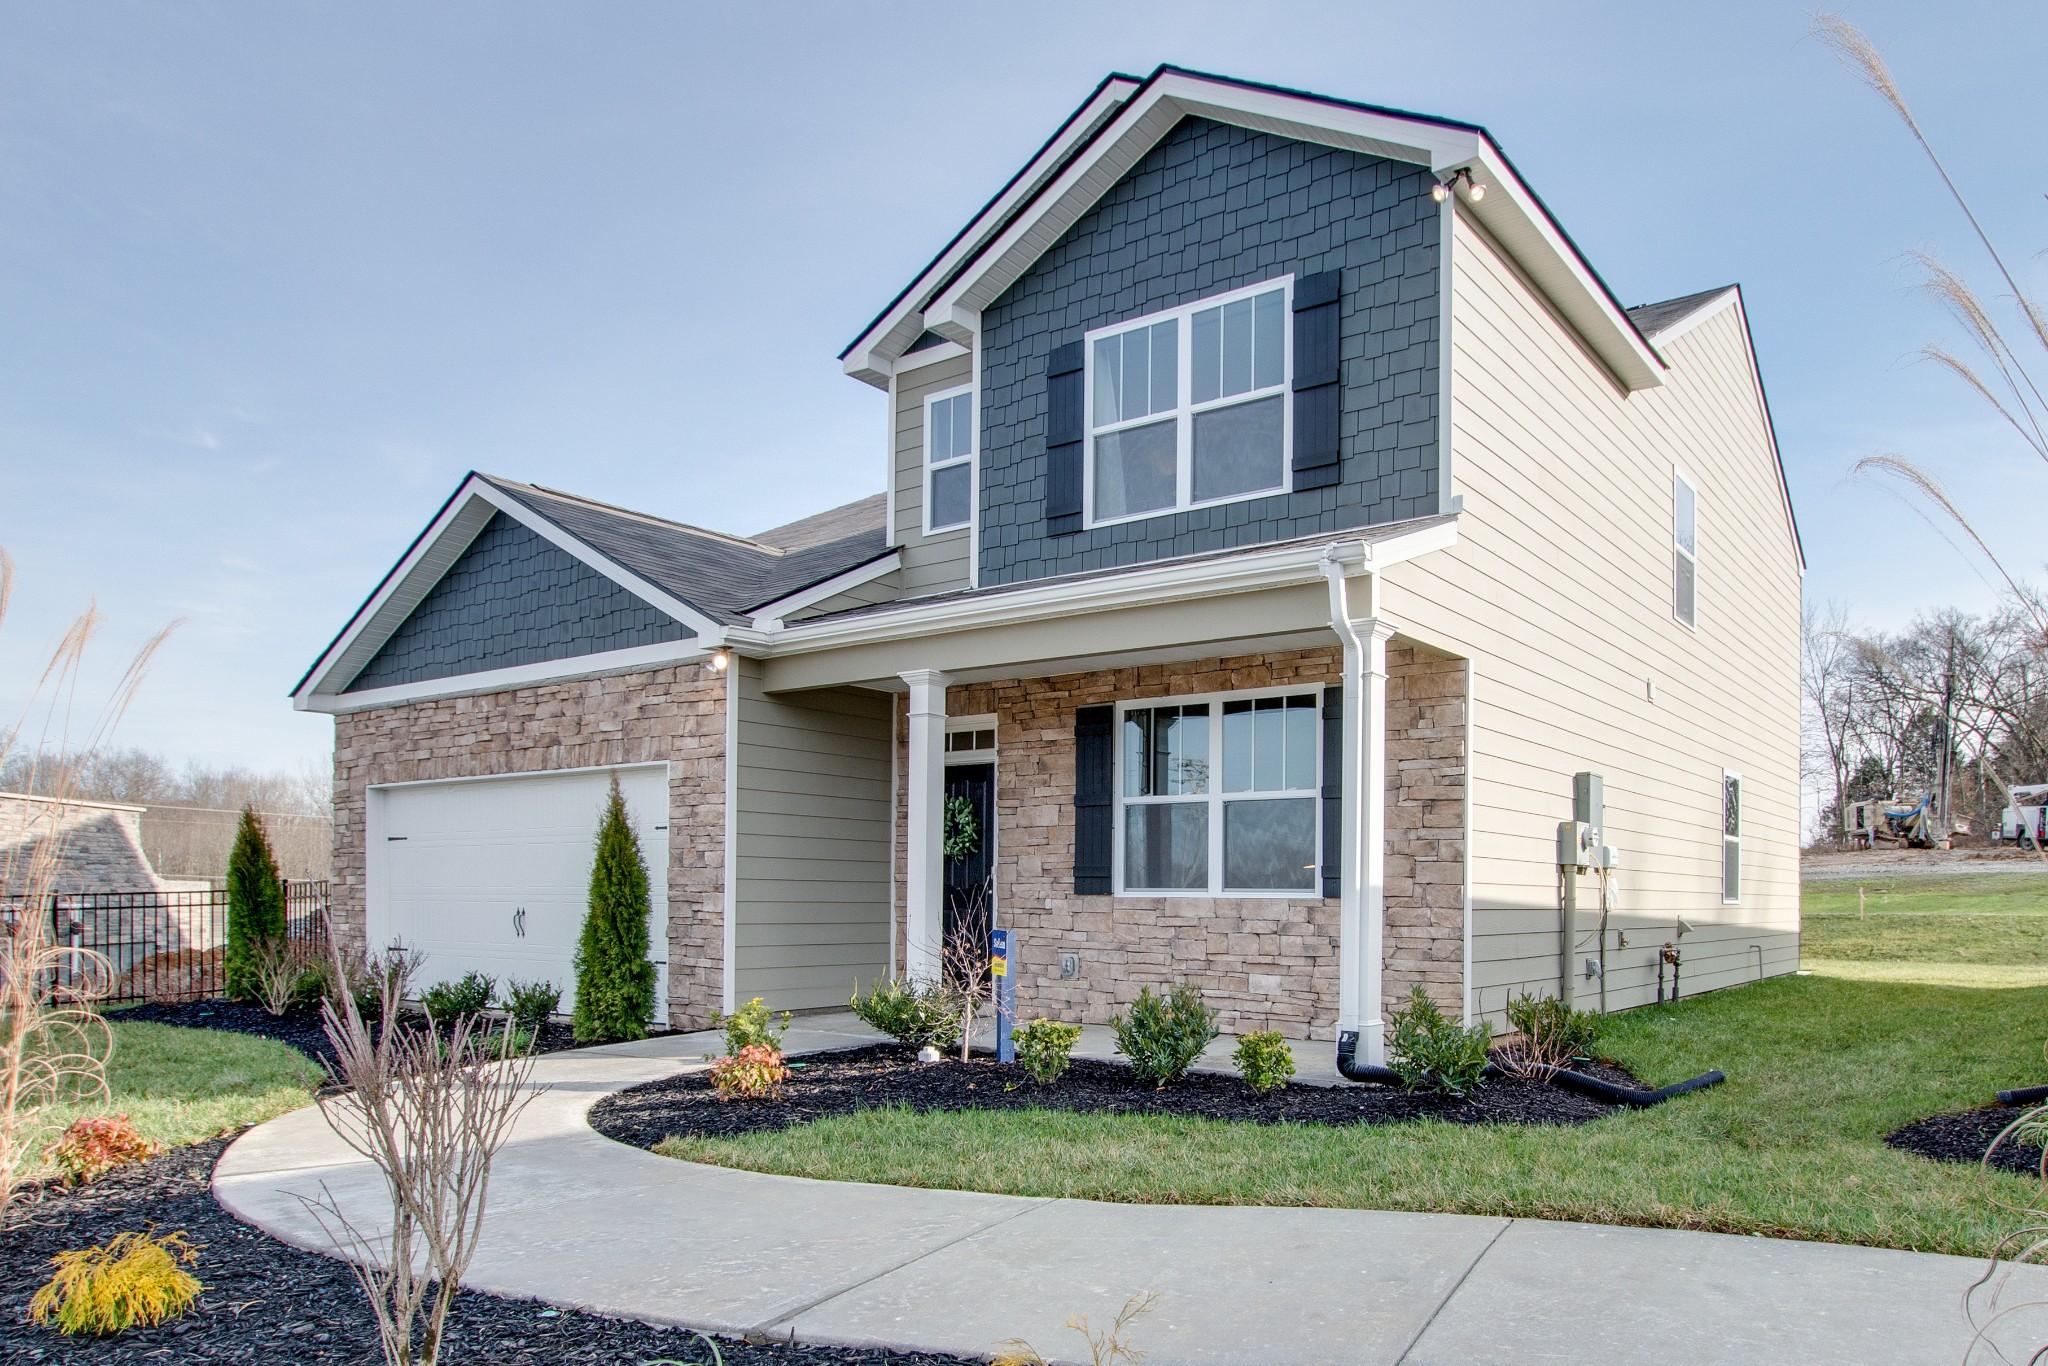 1015 Alta Vista Lane, #05 Property Photo - Smyrna, TN real estate listing